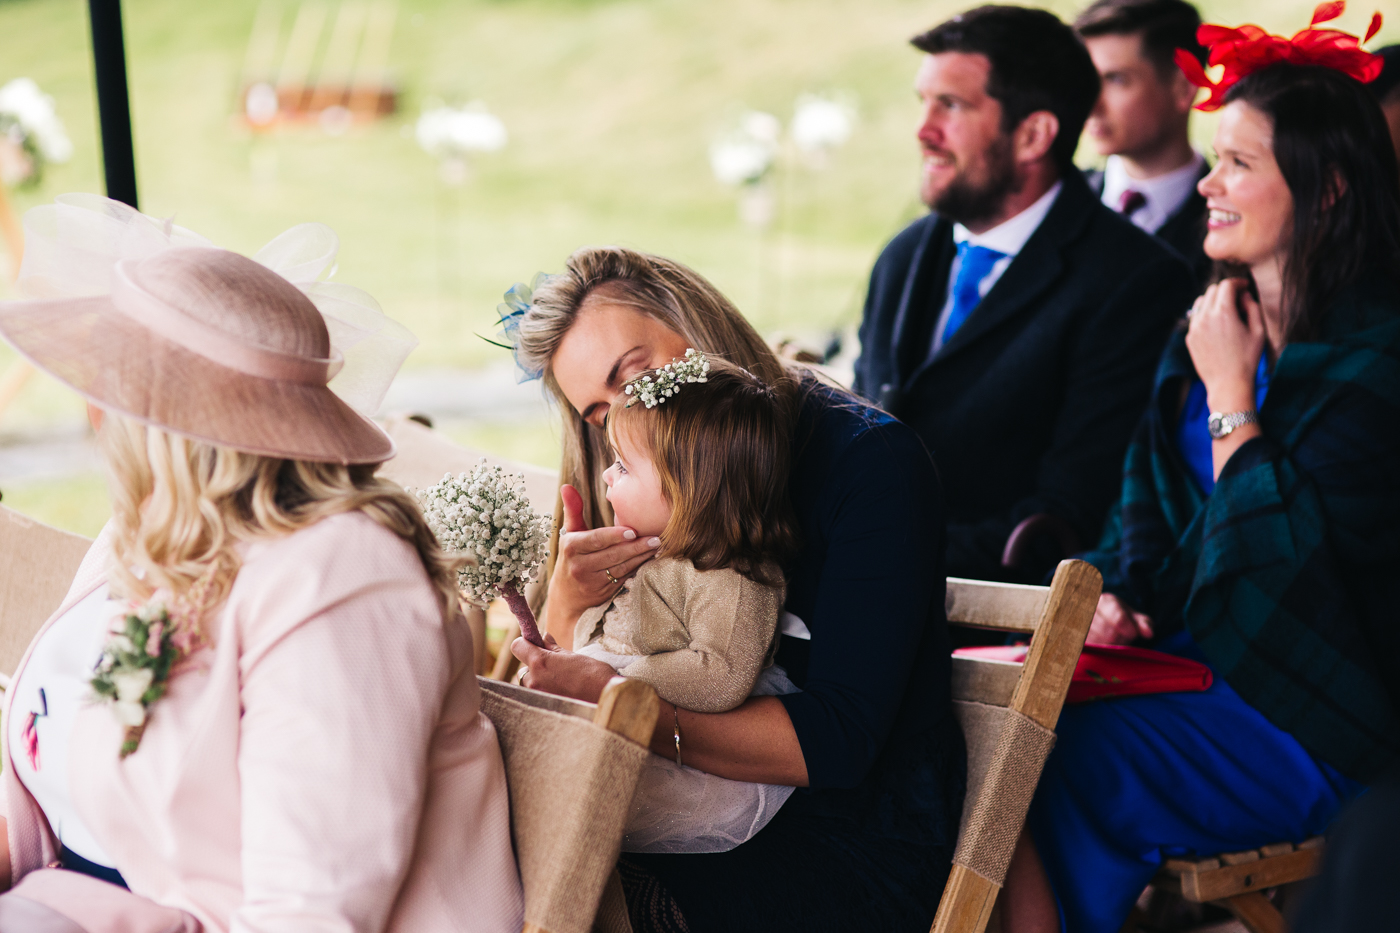 scottish-wedding-trossachs-loch-tay-highlannds-relaxed-photography-photographer-0015.jpg